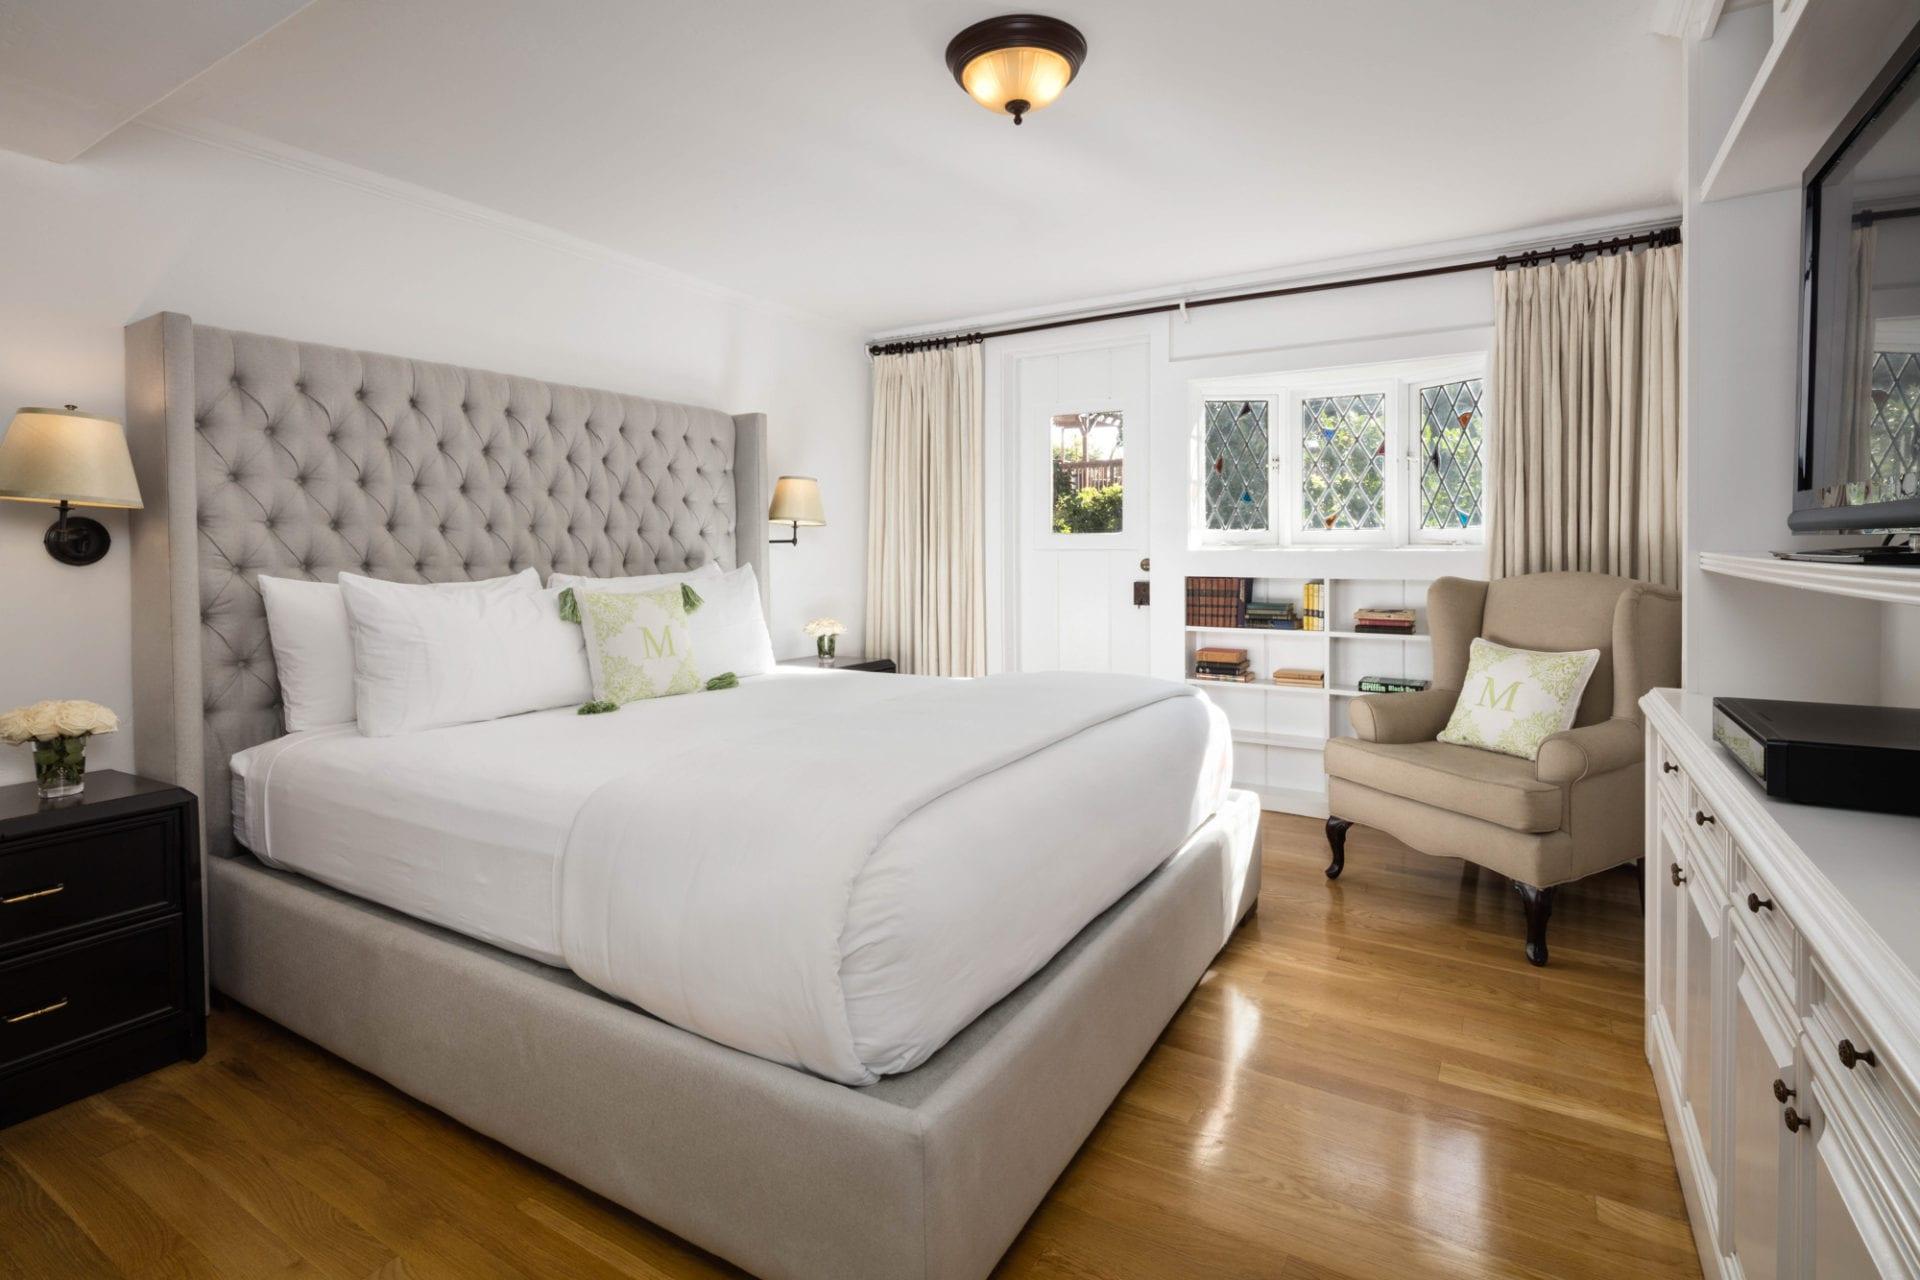 Marlene room